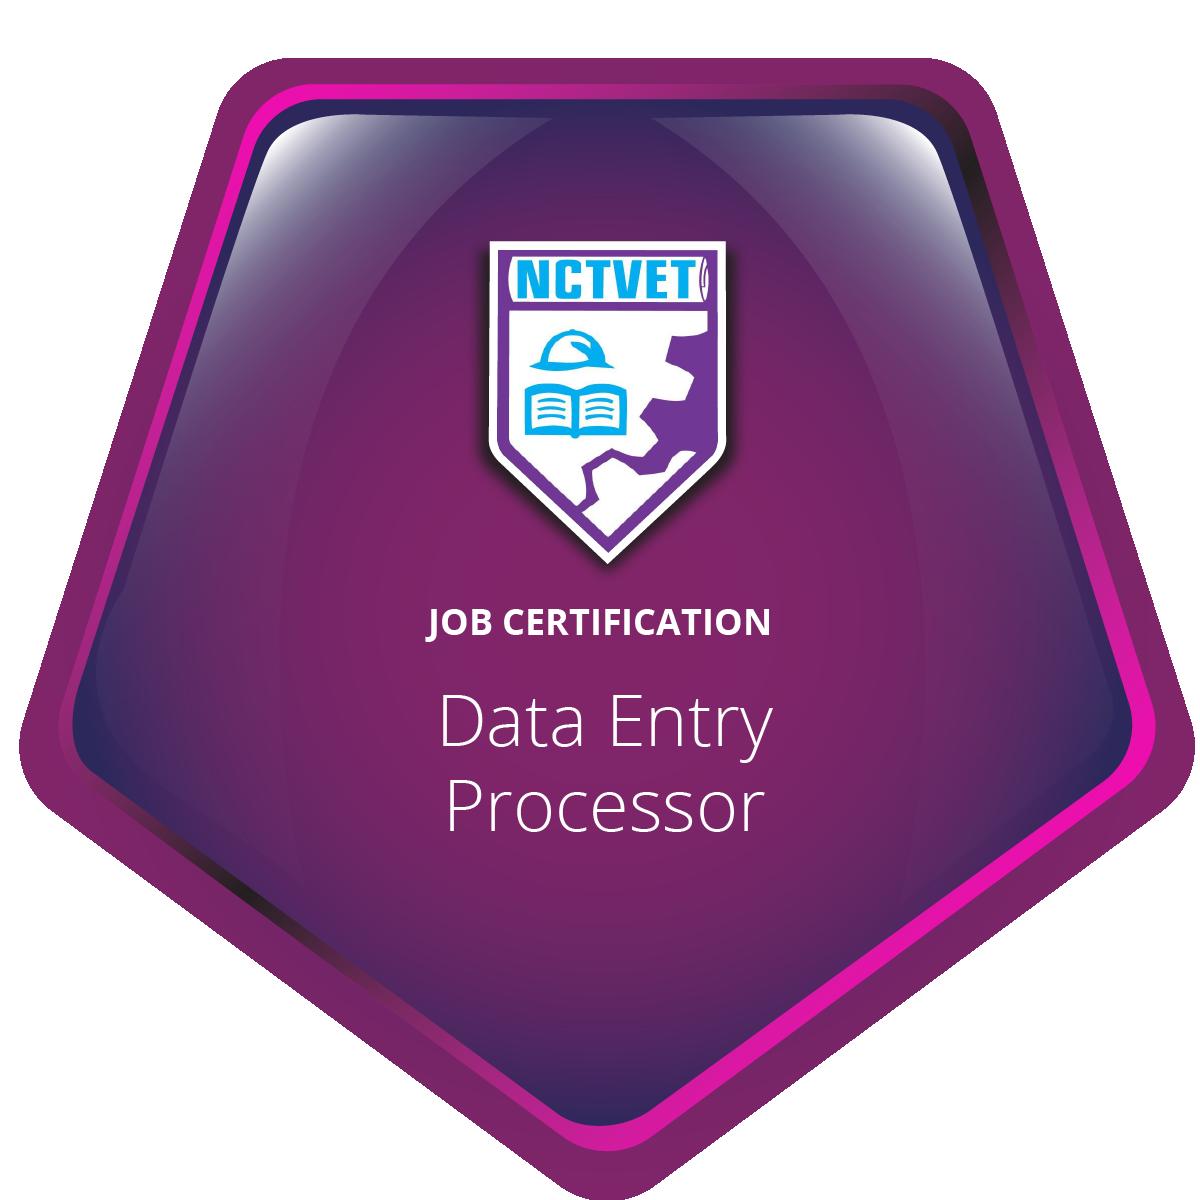 Data Entry Processor (Job Certification) J02ITI20119